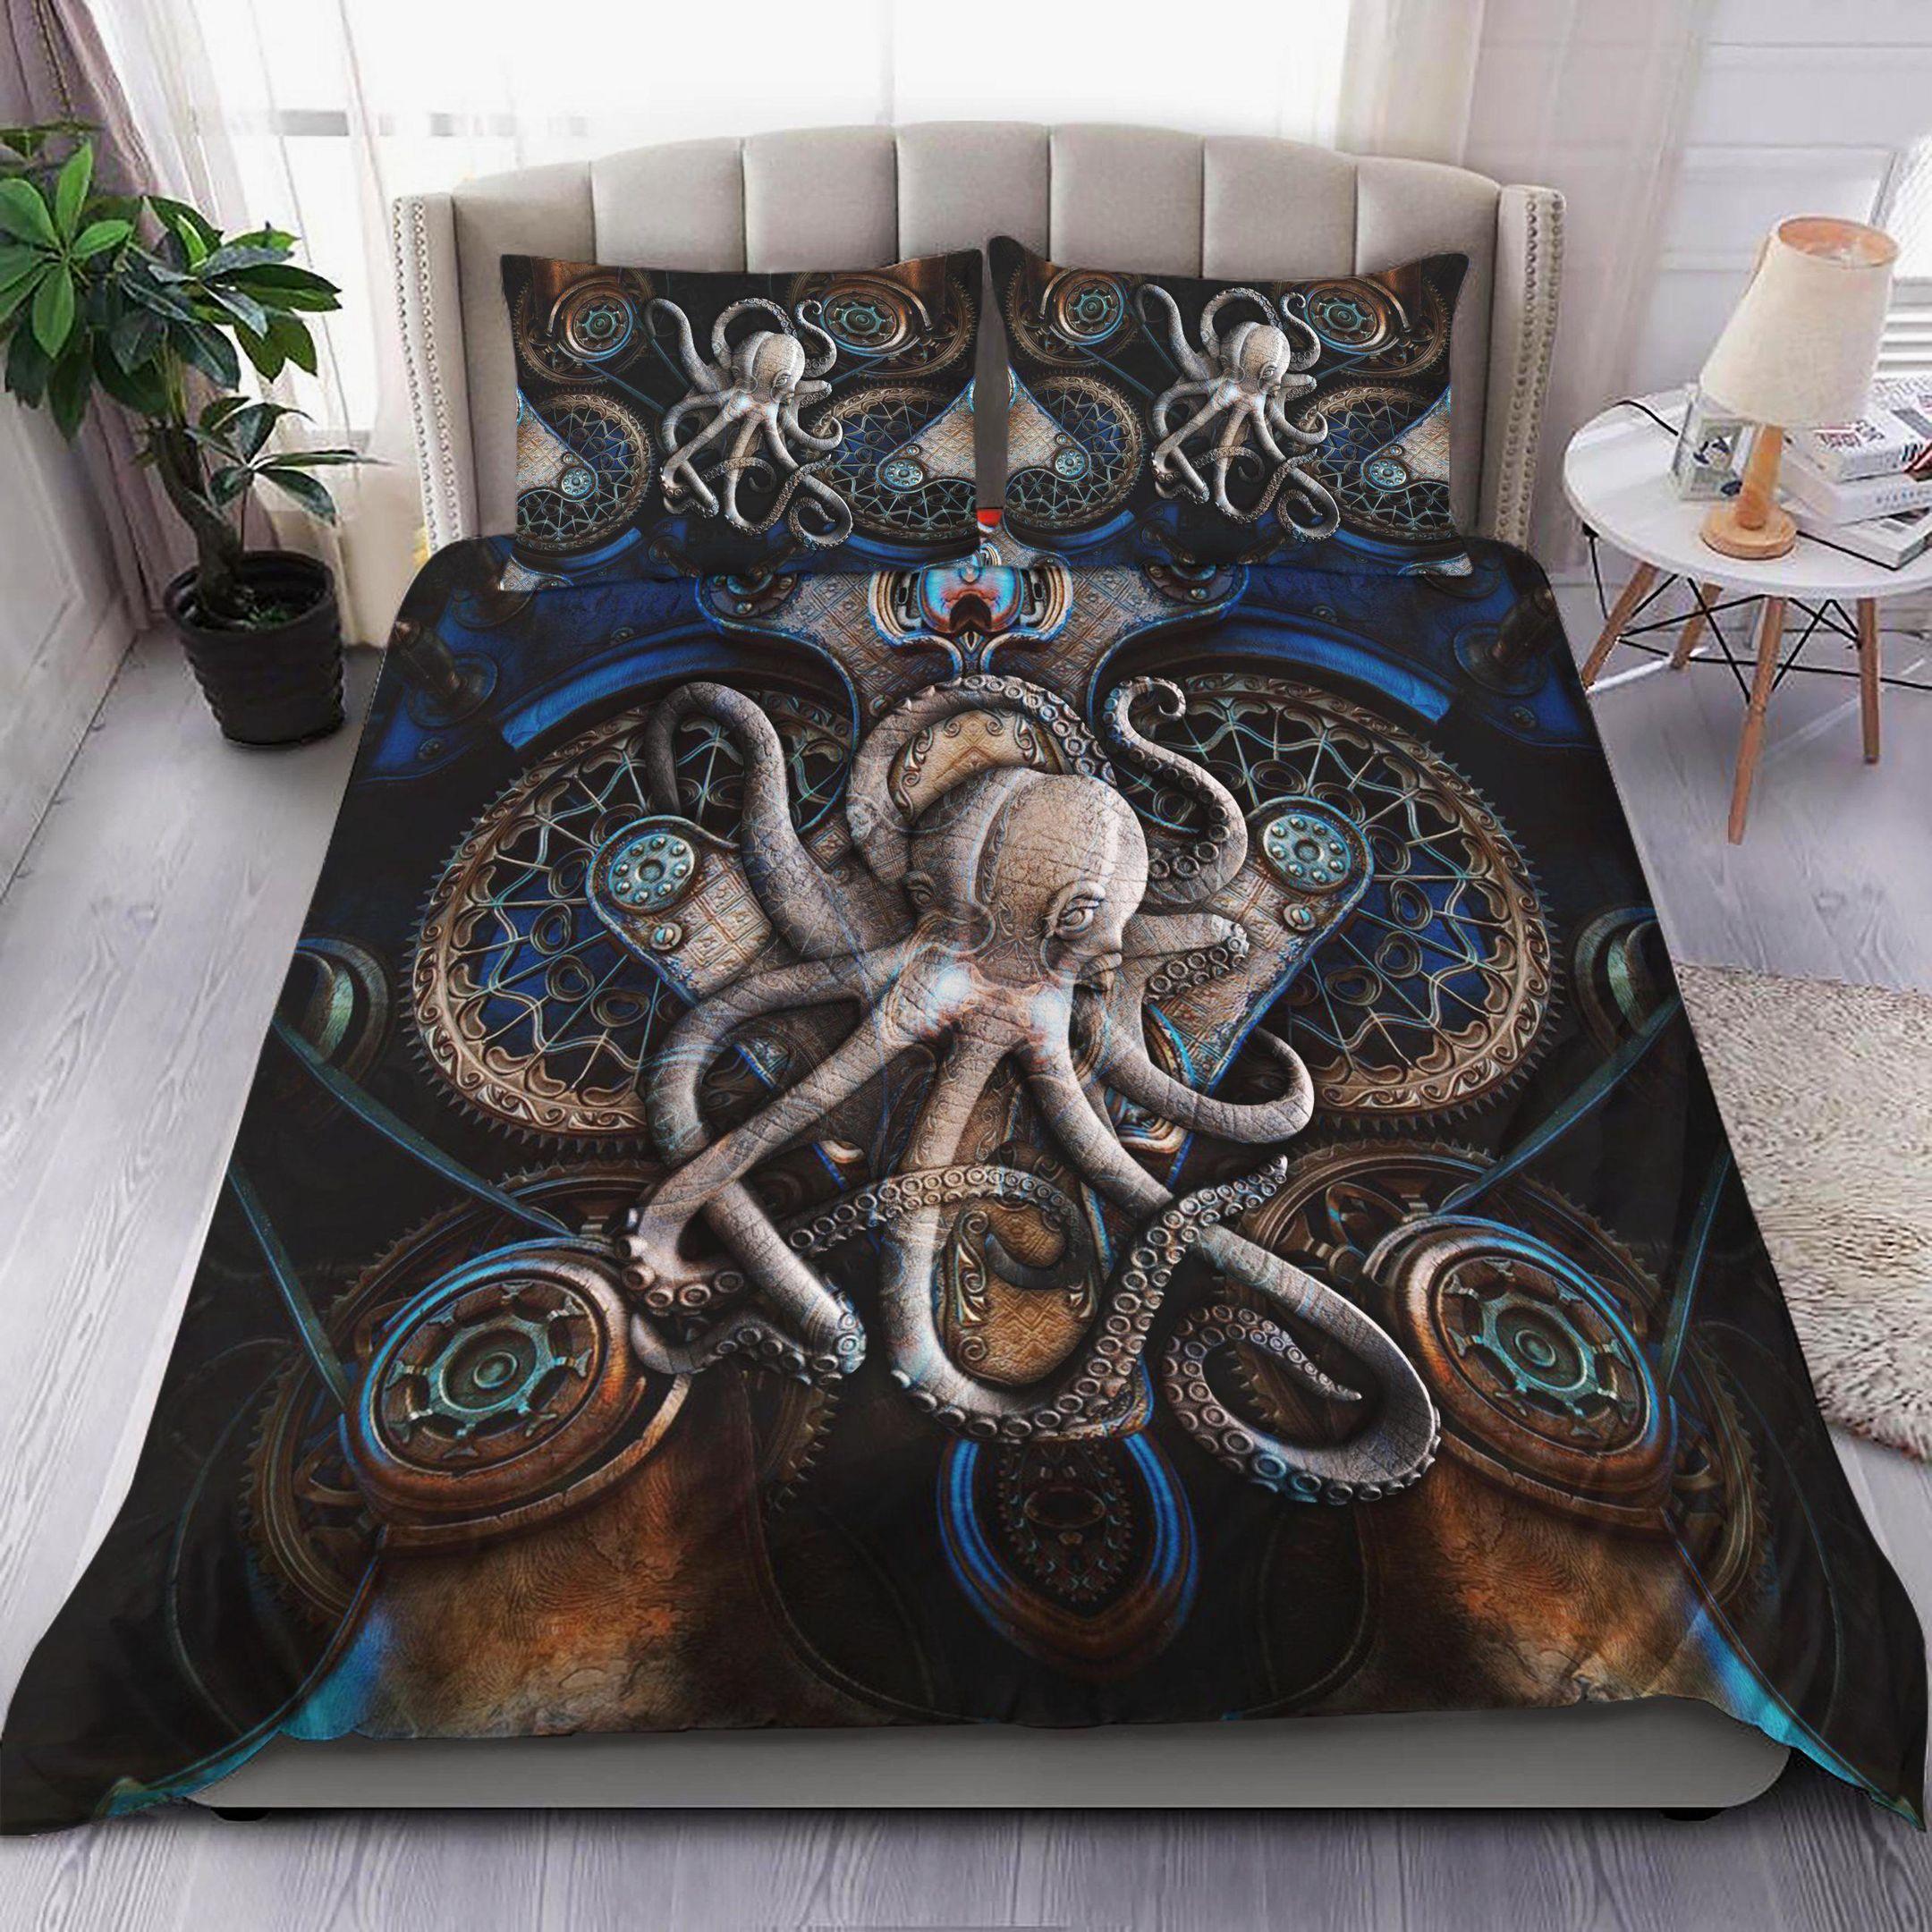 Kraken Octopus Stone Statue Pattern Quilt Bedding Set